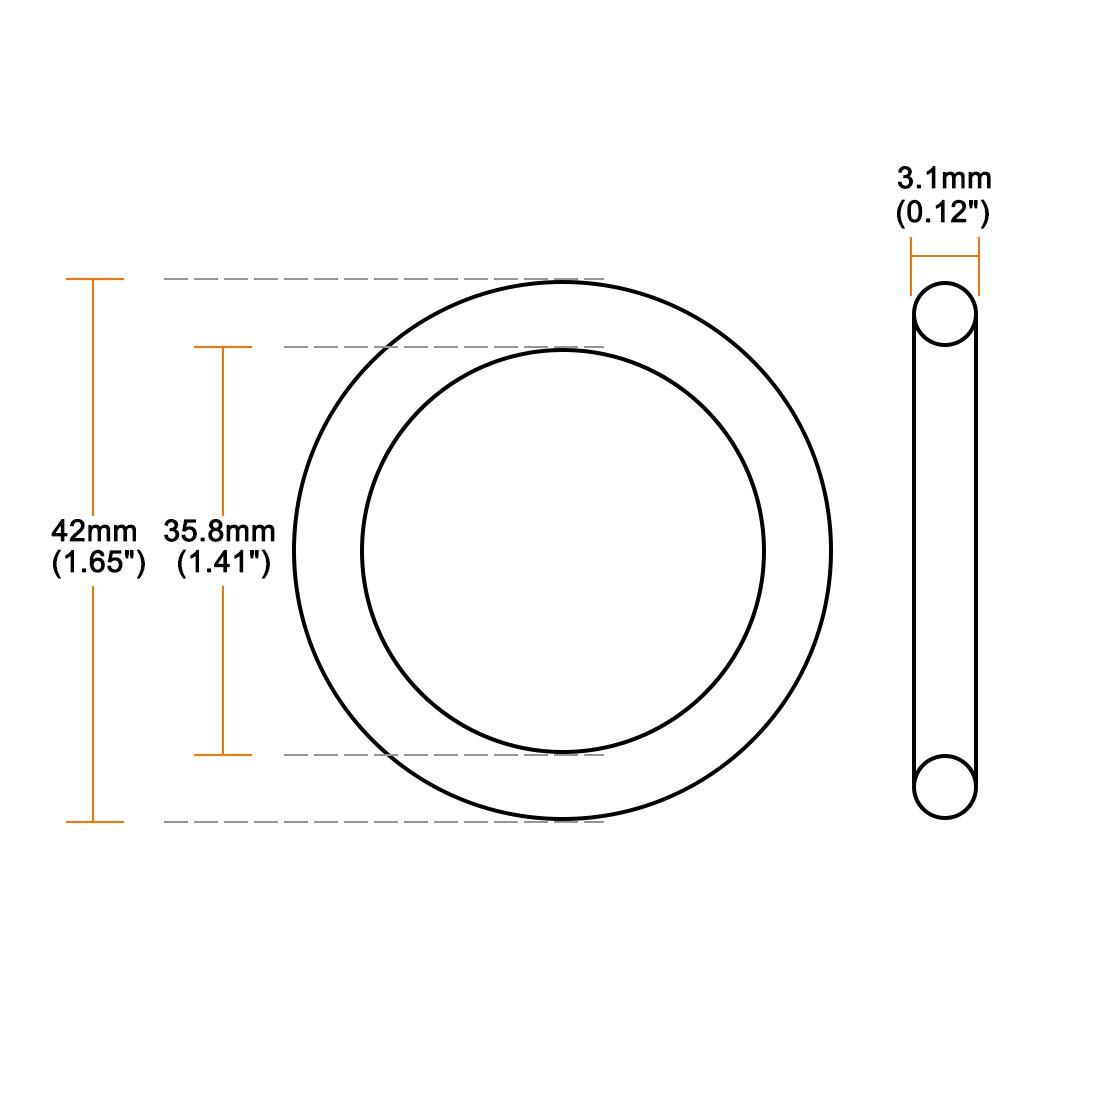 sourcing map 5pcs O-Ring Nitrilkautschuk Gummi 28,8mm x 35mm x 3,1mm Dichtungsringe Dichtung DE